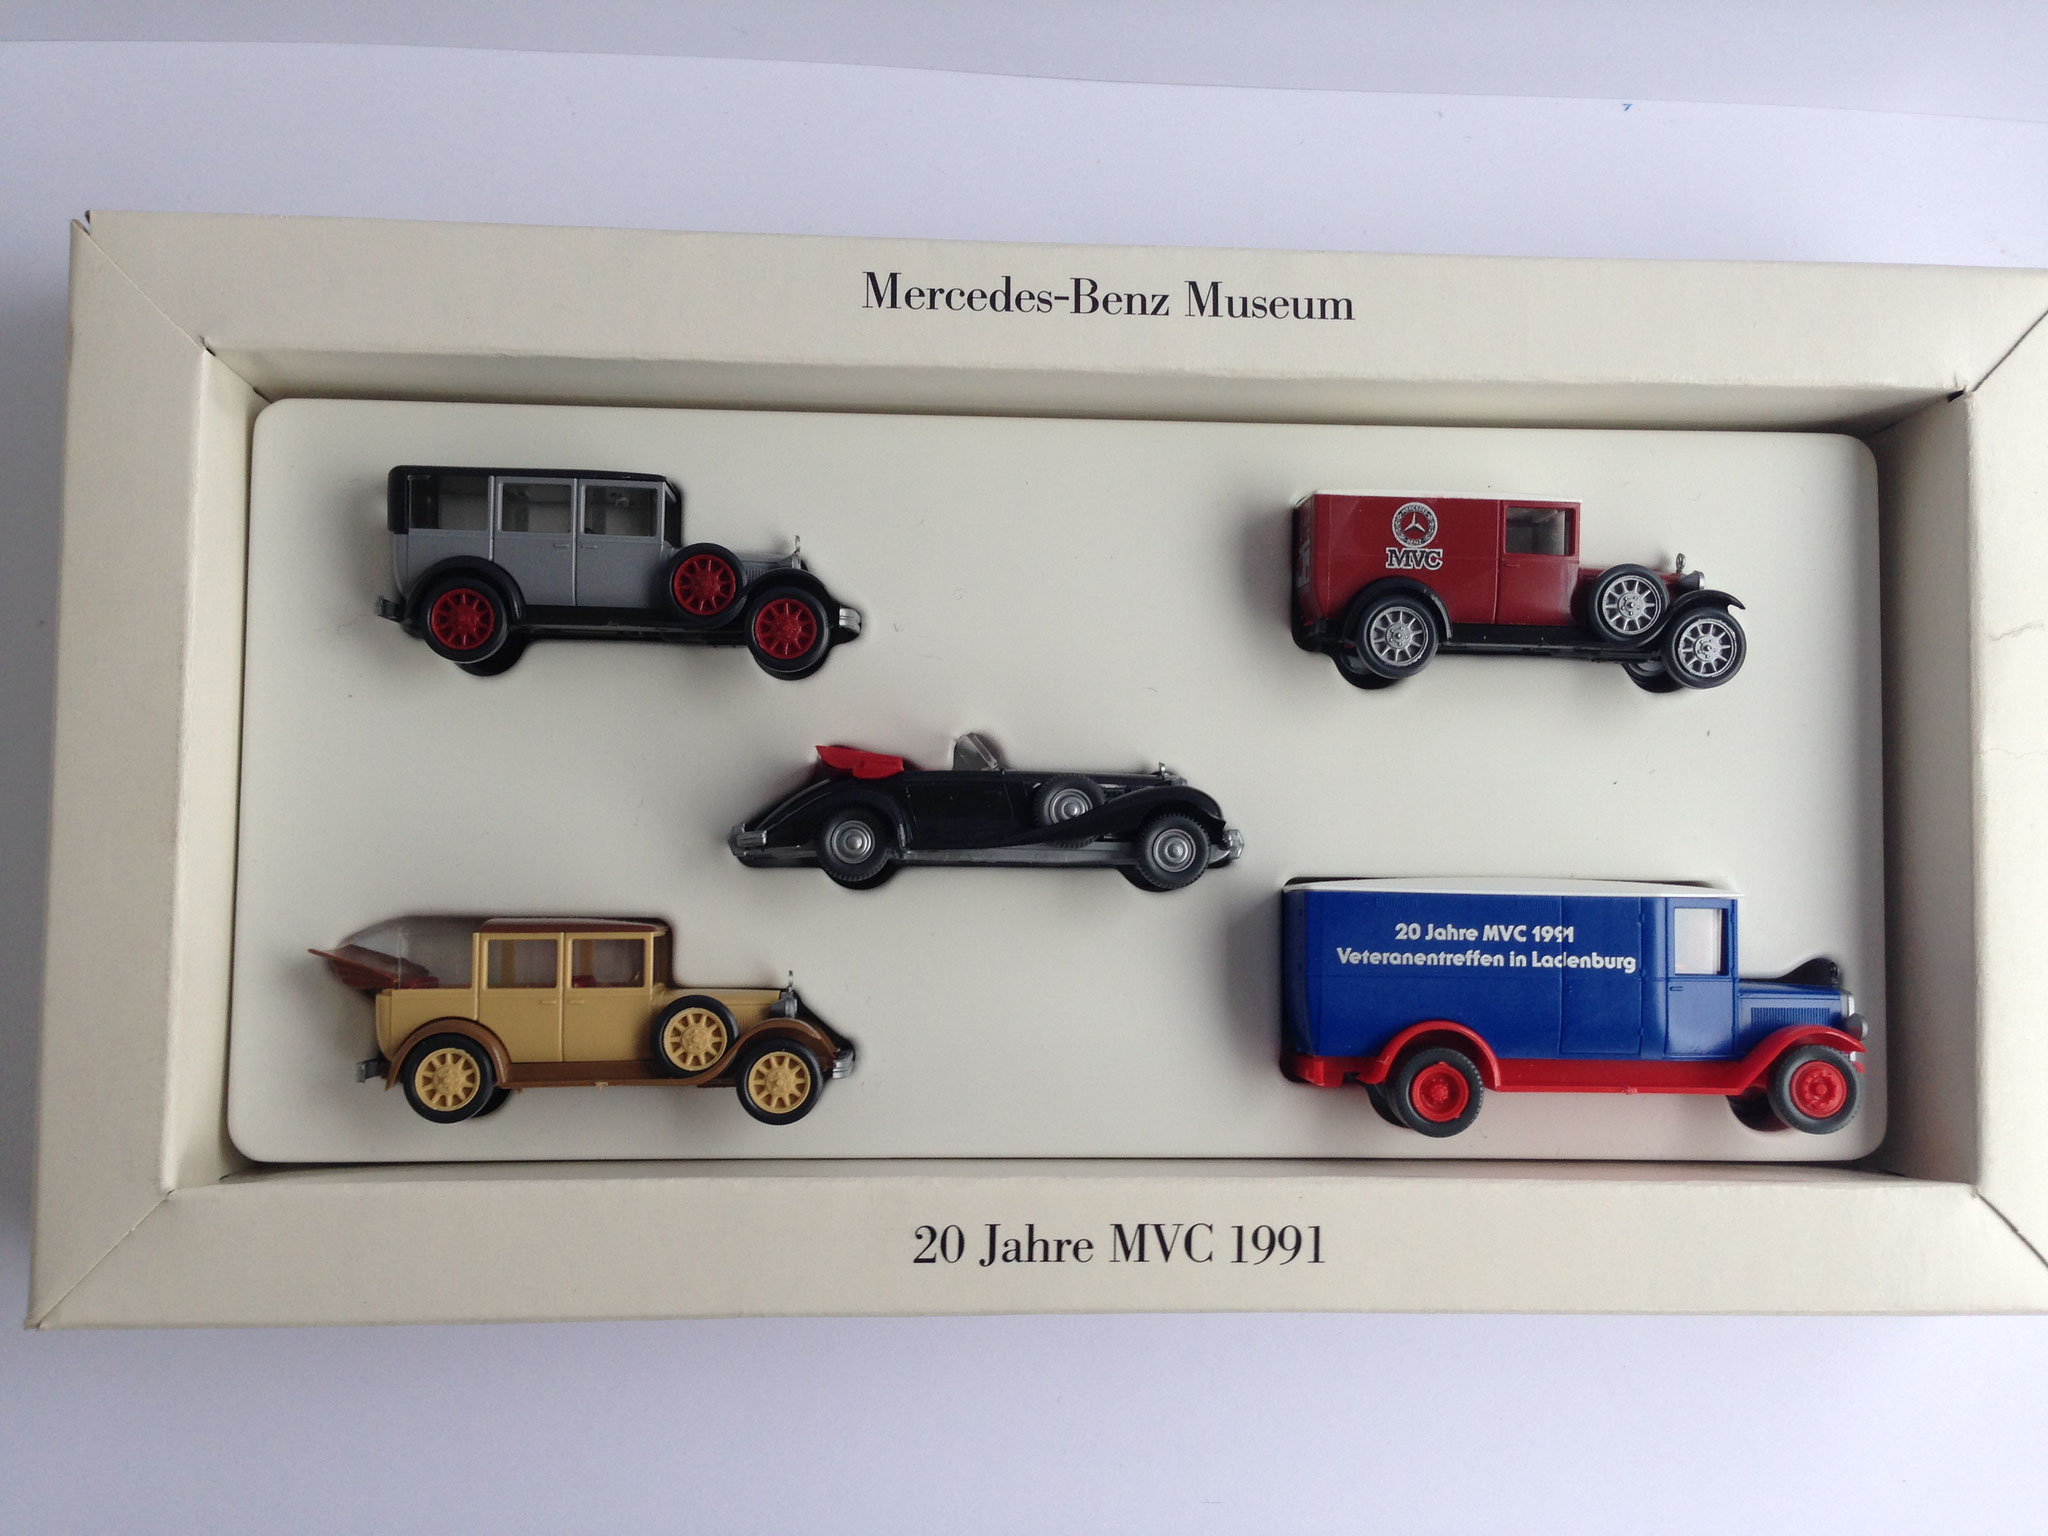 Set 20 Jahre MVC 1991 (MB-Museum)